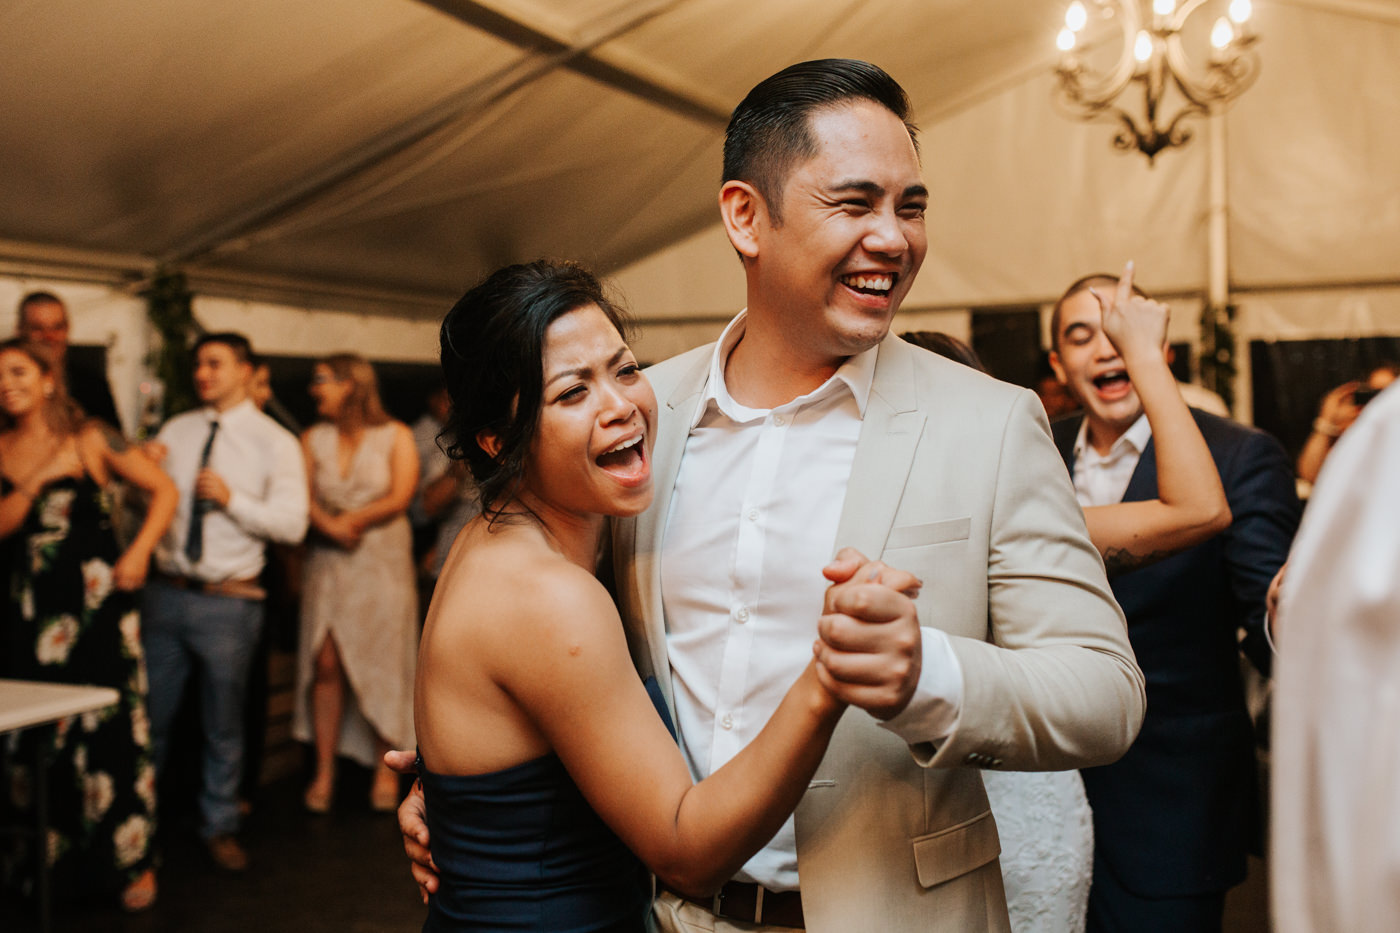 Nick & Vanezza - Fernbank Farm Wedding - Samantha Heather Photography-171.jpg